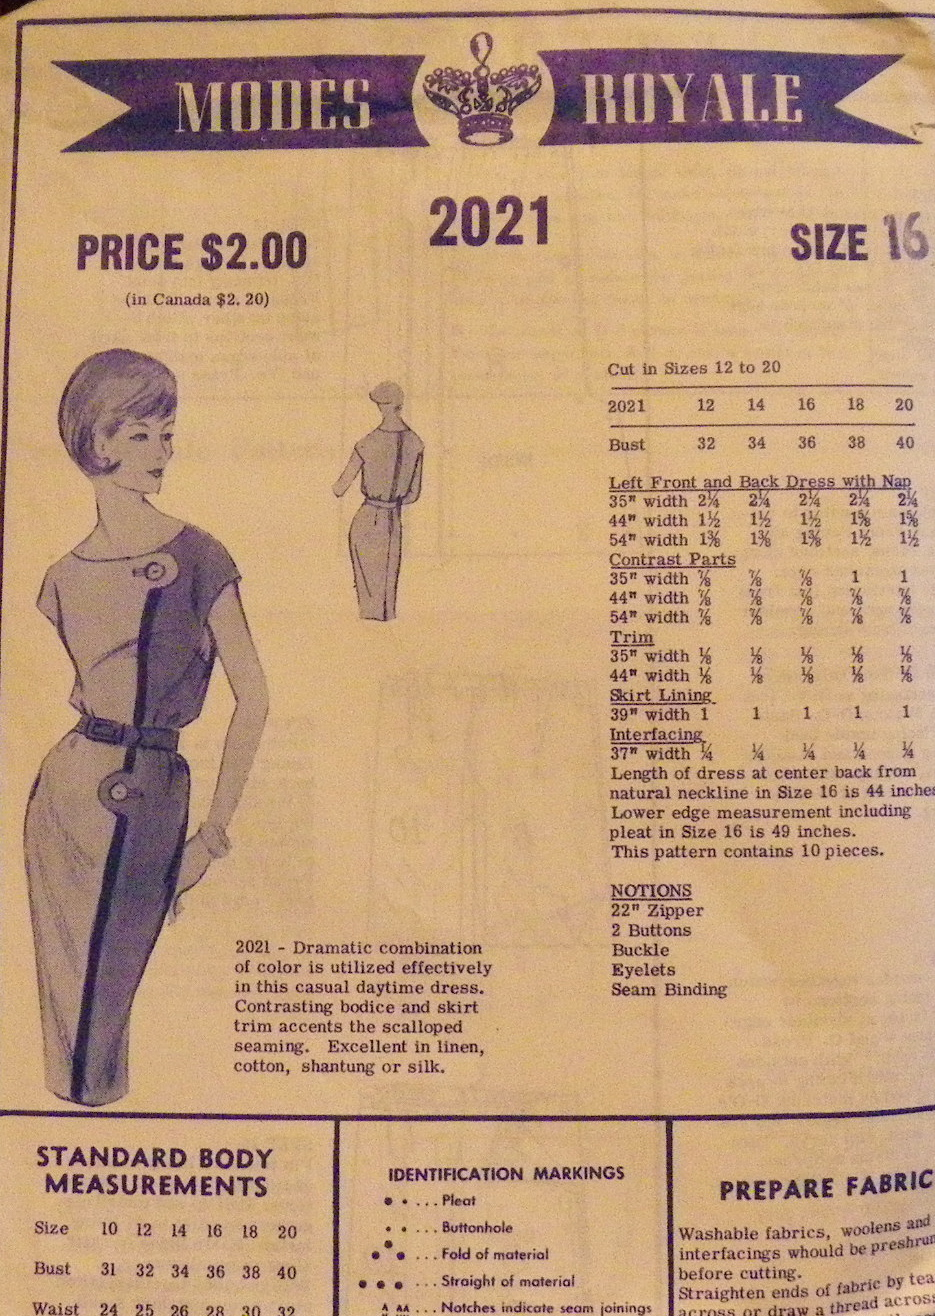 Modes Royale 2021